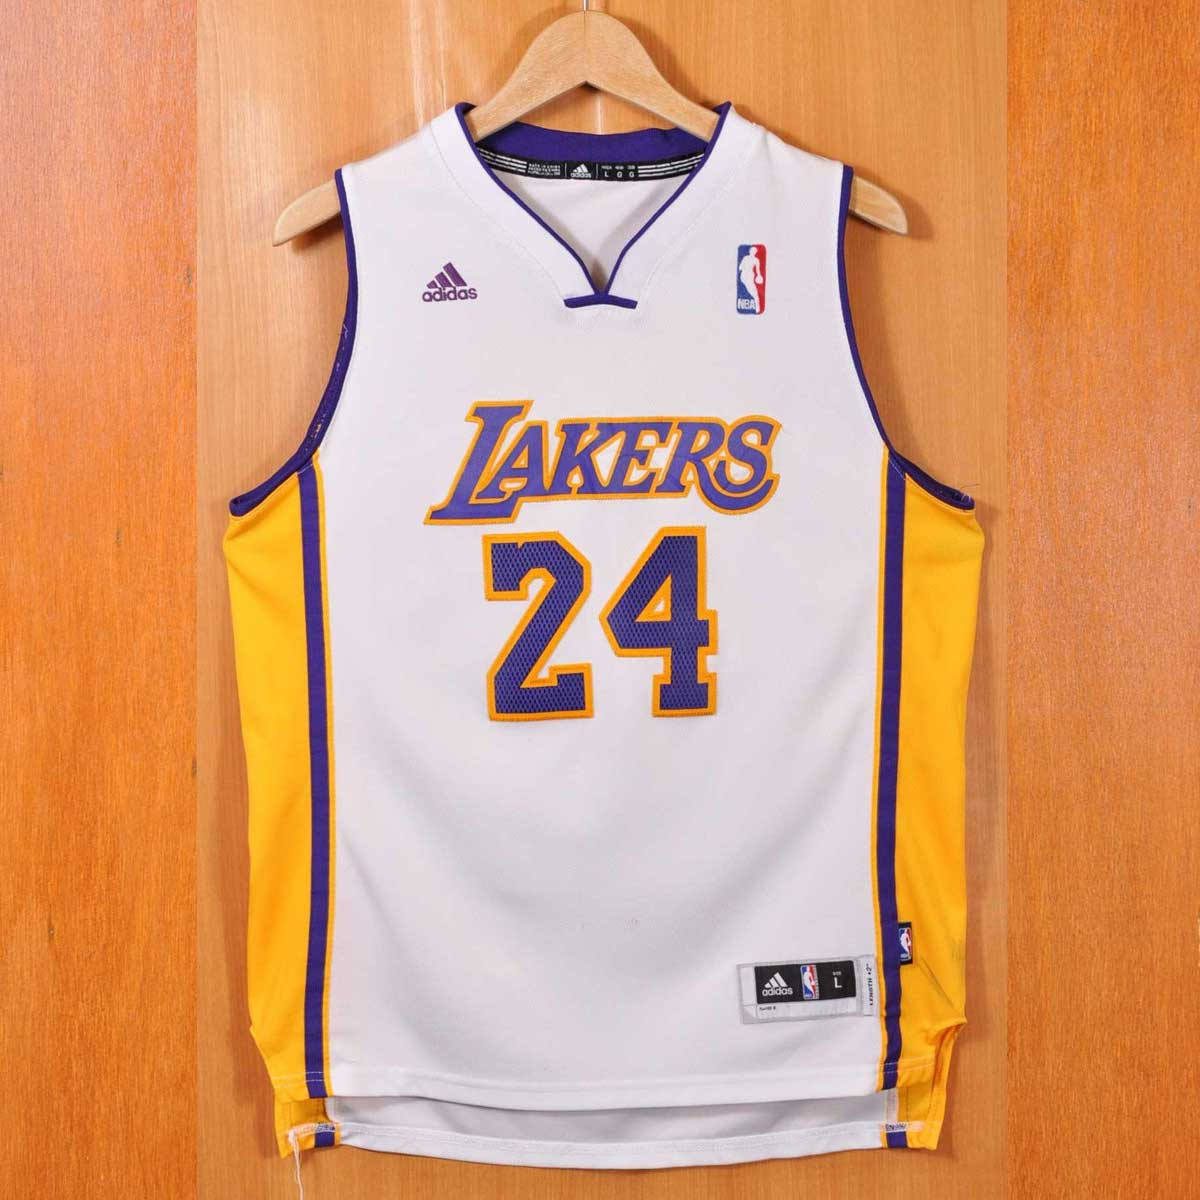 6dabdbd4c adidas Adidas NBA LOS ANGELES LAKERS Los Angeles Lakers Kobe Bryant  basketball tank top uniform numbering white lady s L equivalency▽